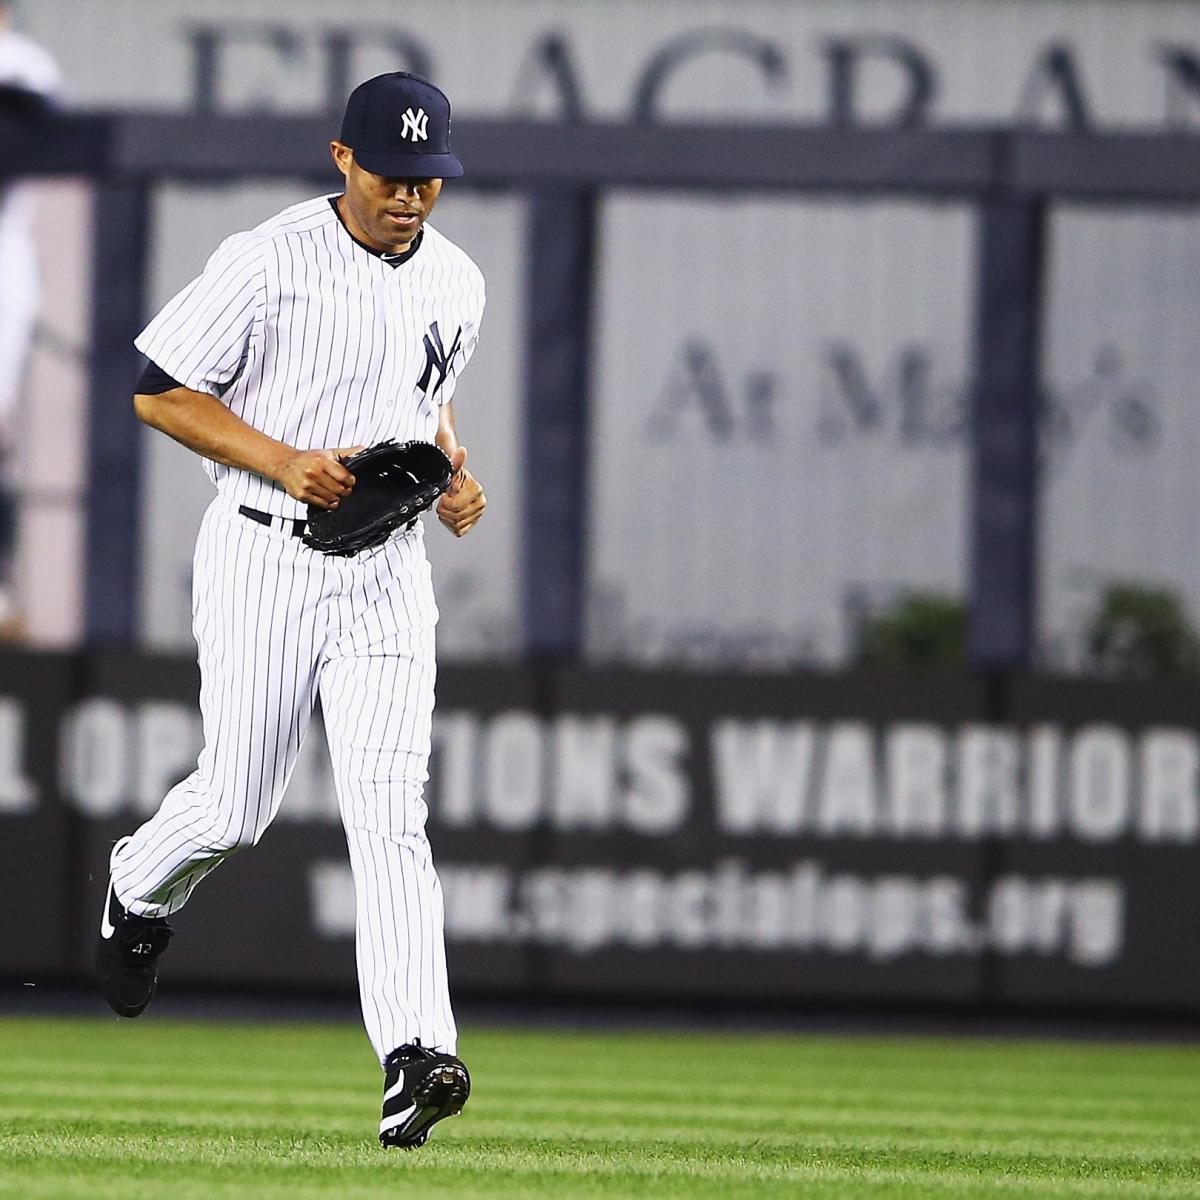 Mariano Rivera Entering The Game